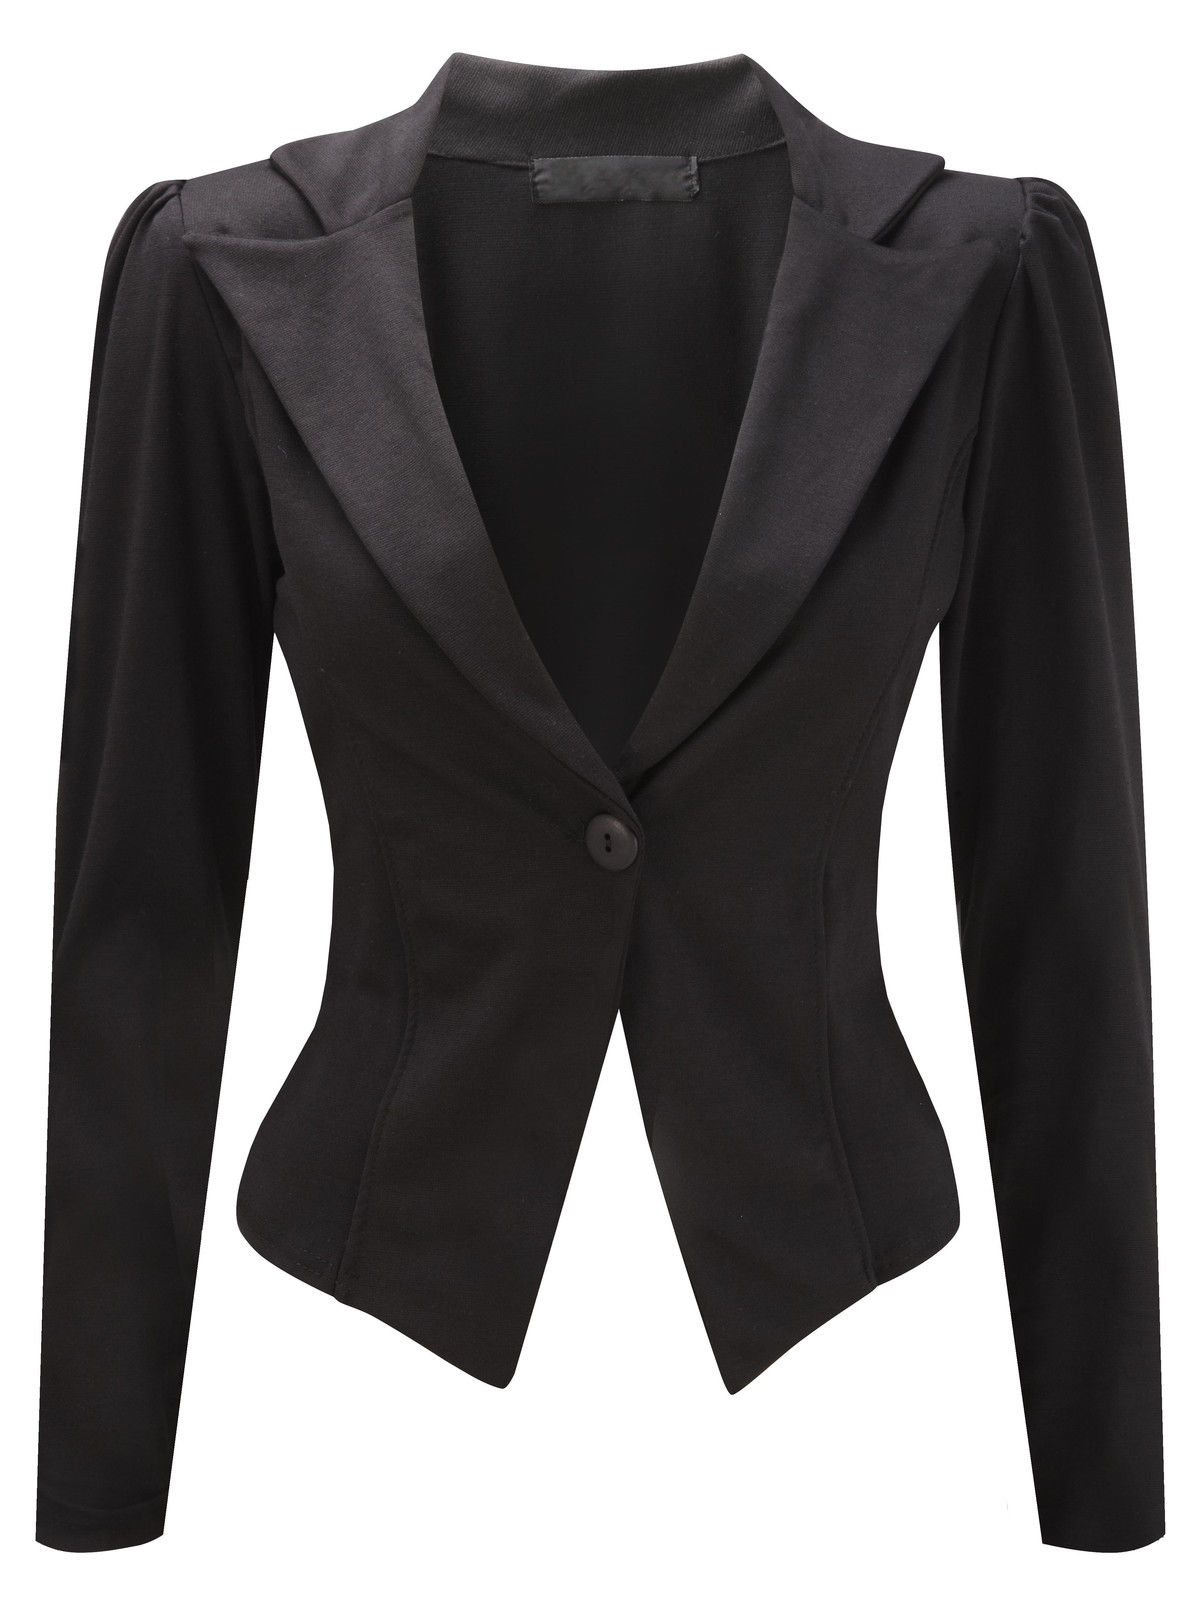 Black tailored jacket womens